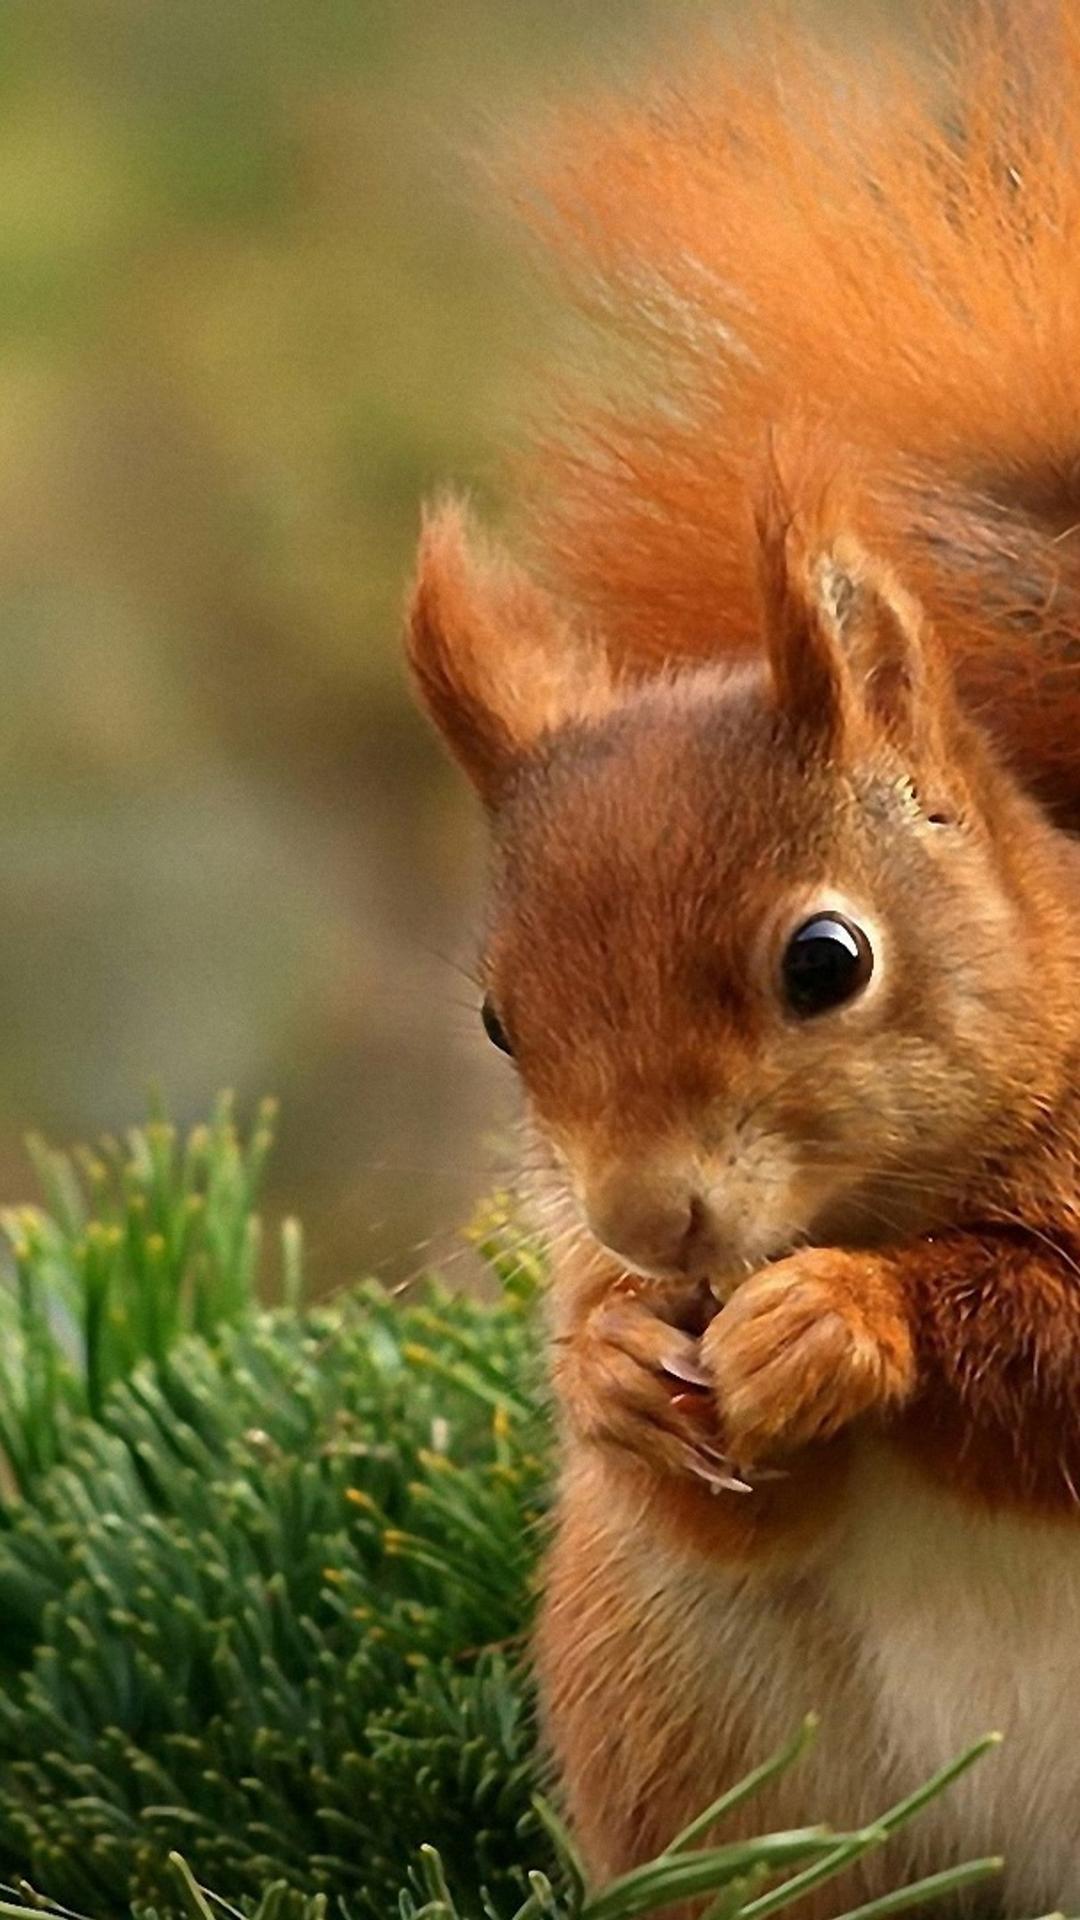 Popular Wallpaper Mobile Animal - red-squirrel-eat-nuts-sweet-little-wild-animal-1080x1920  Trends_359219.jpg